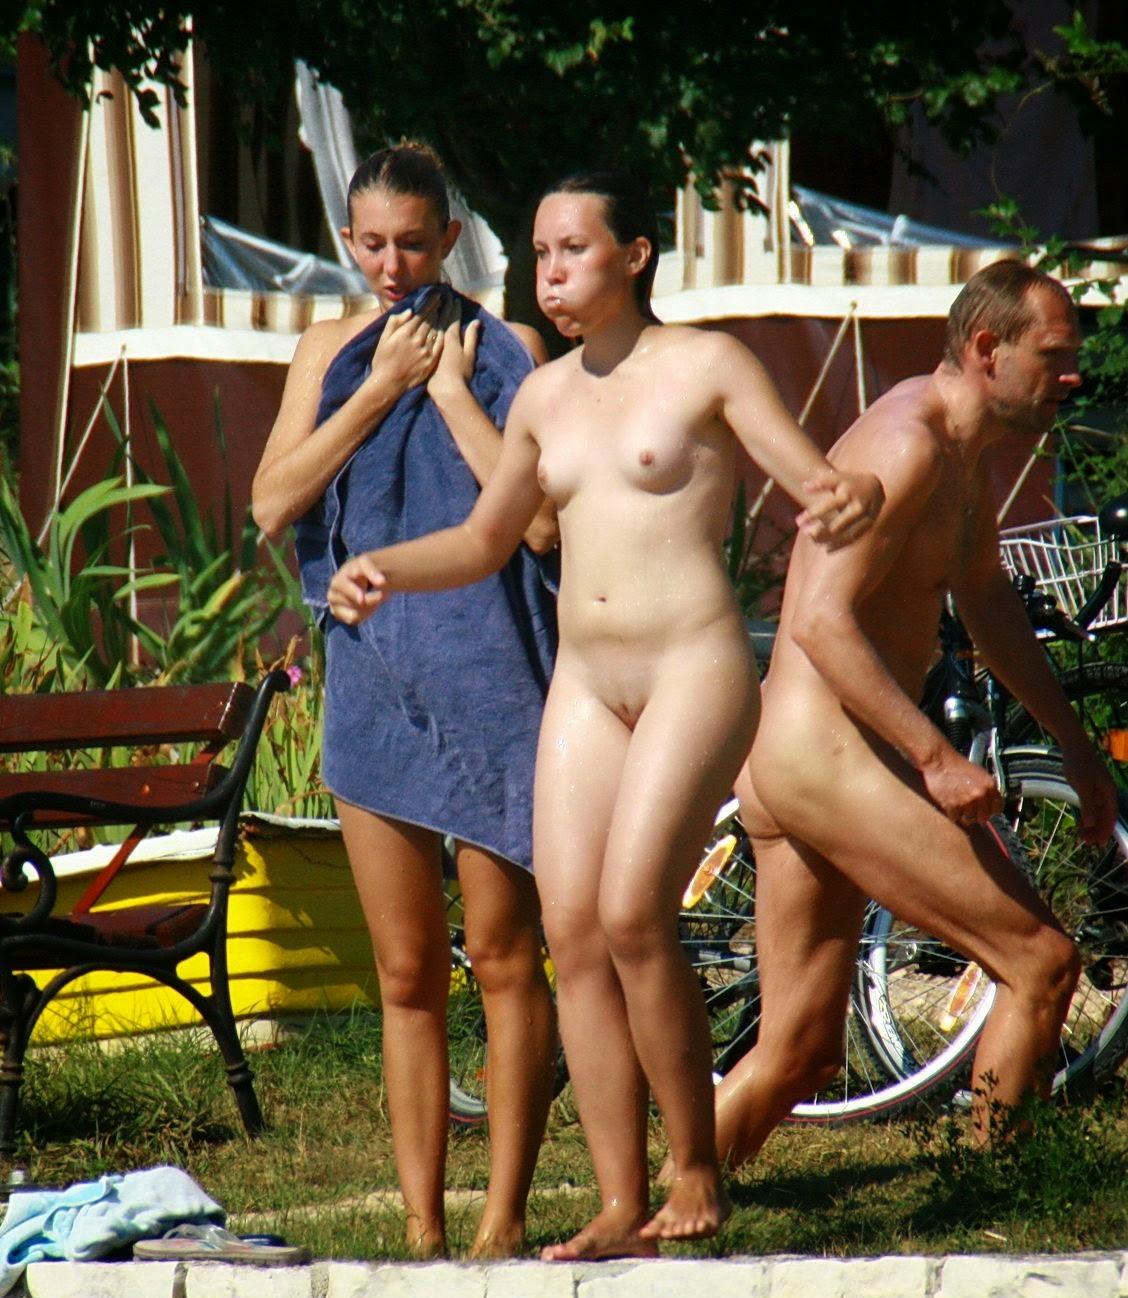 girl on show camp nude photo